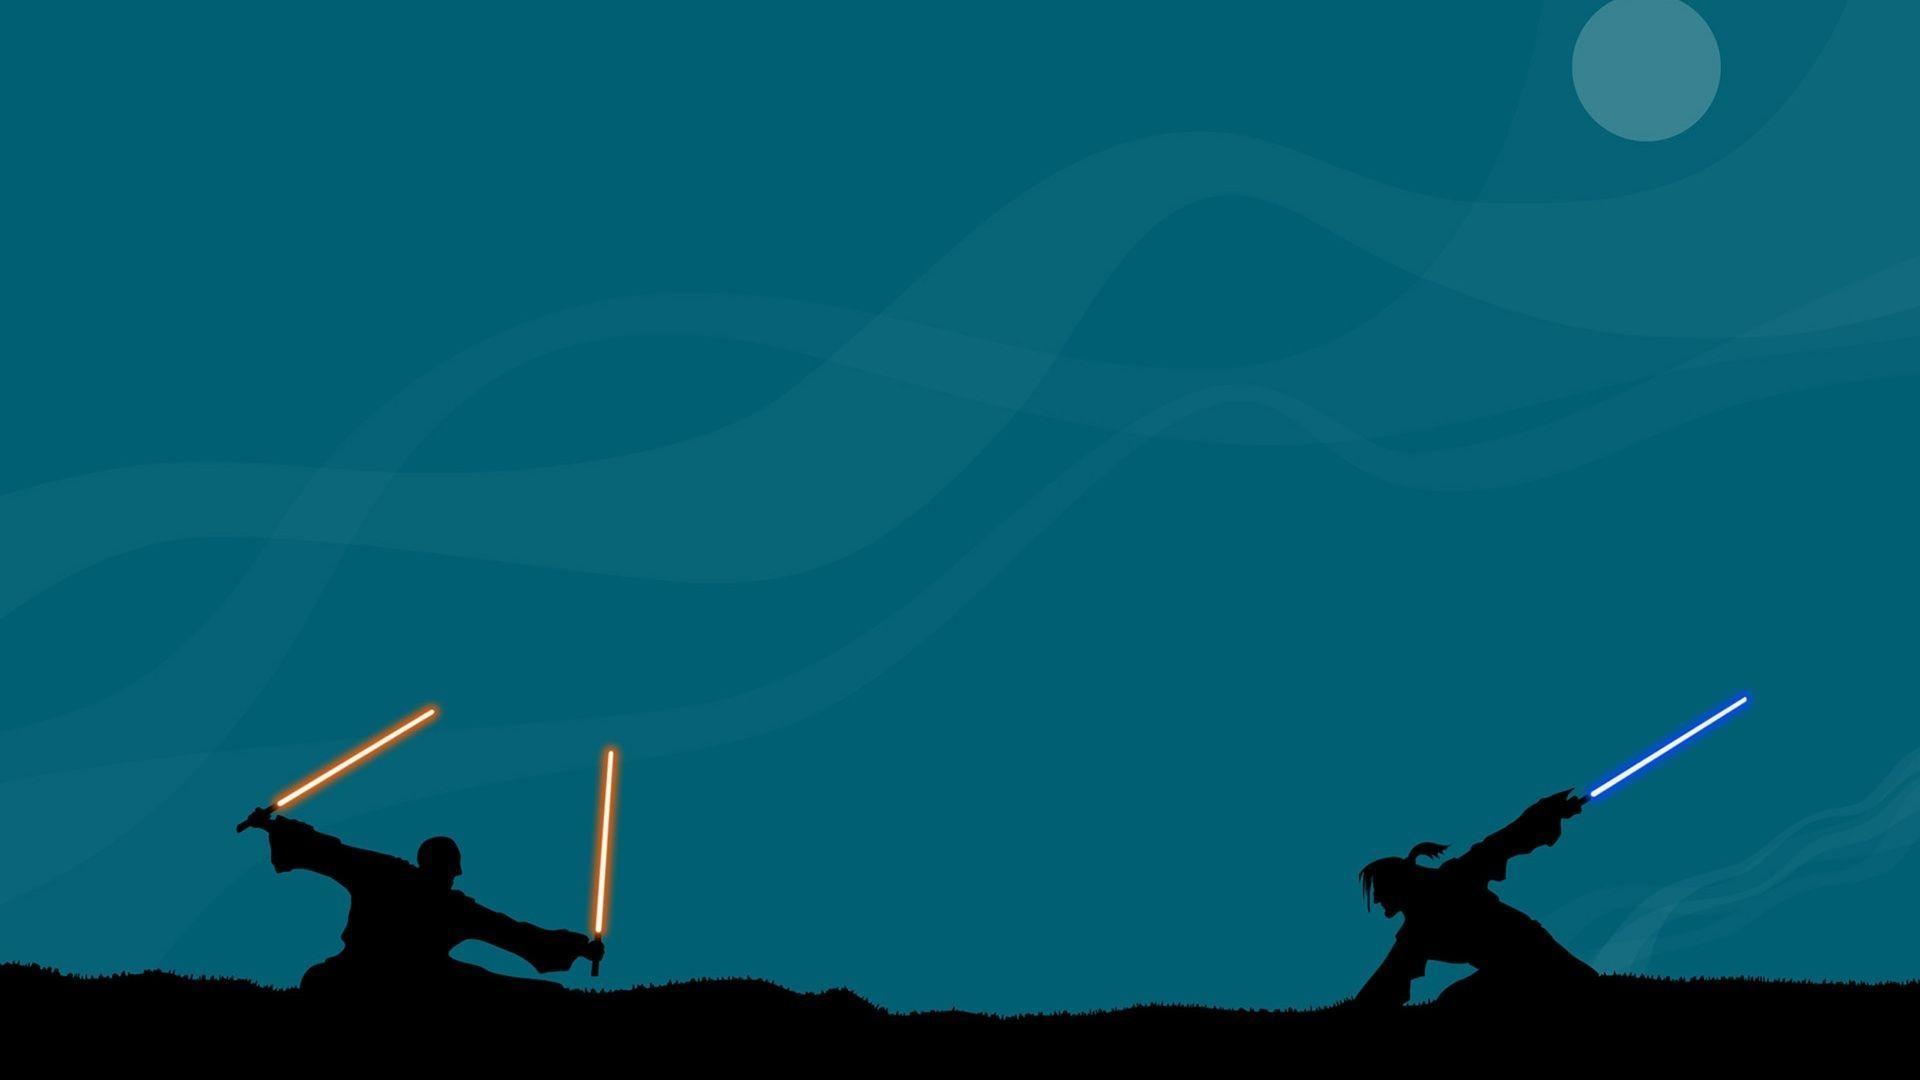 Star Wars Background Np69 Suhu Wallpaper